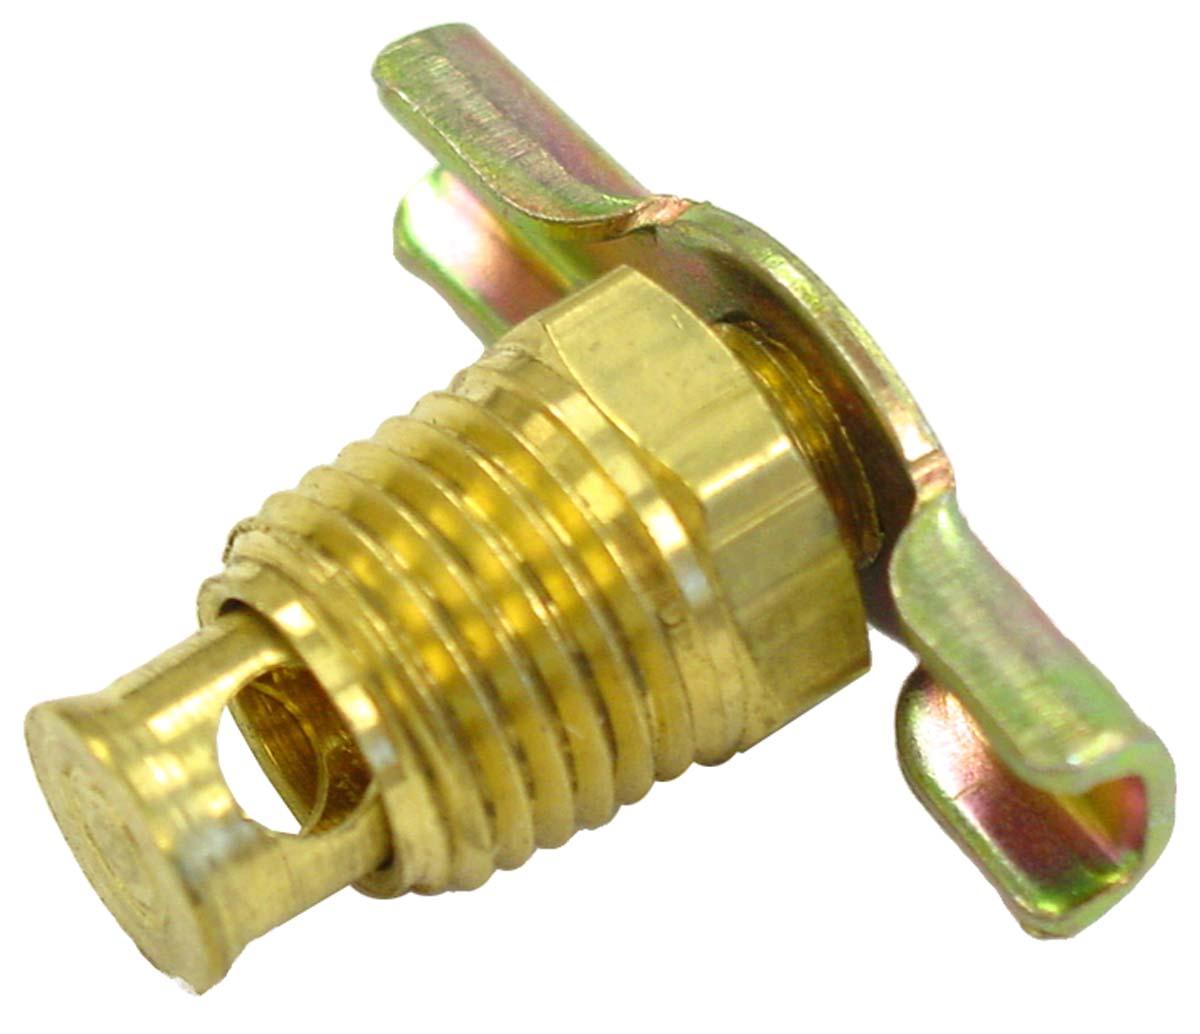 8n ford rims 2016 f150 wiring diagrams abc209 - radiator drain plug n tractor parts for series tractors, 8n, 2n ...